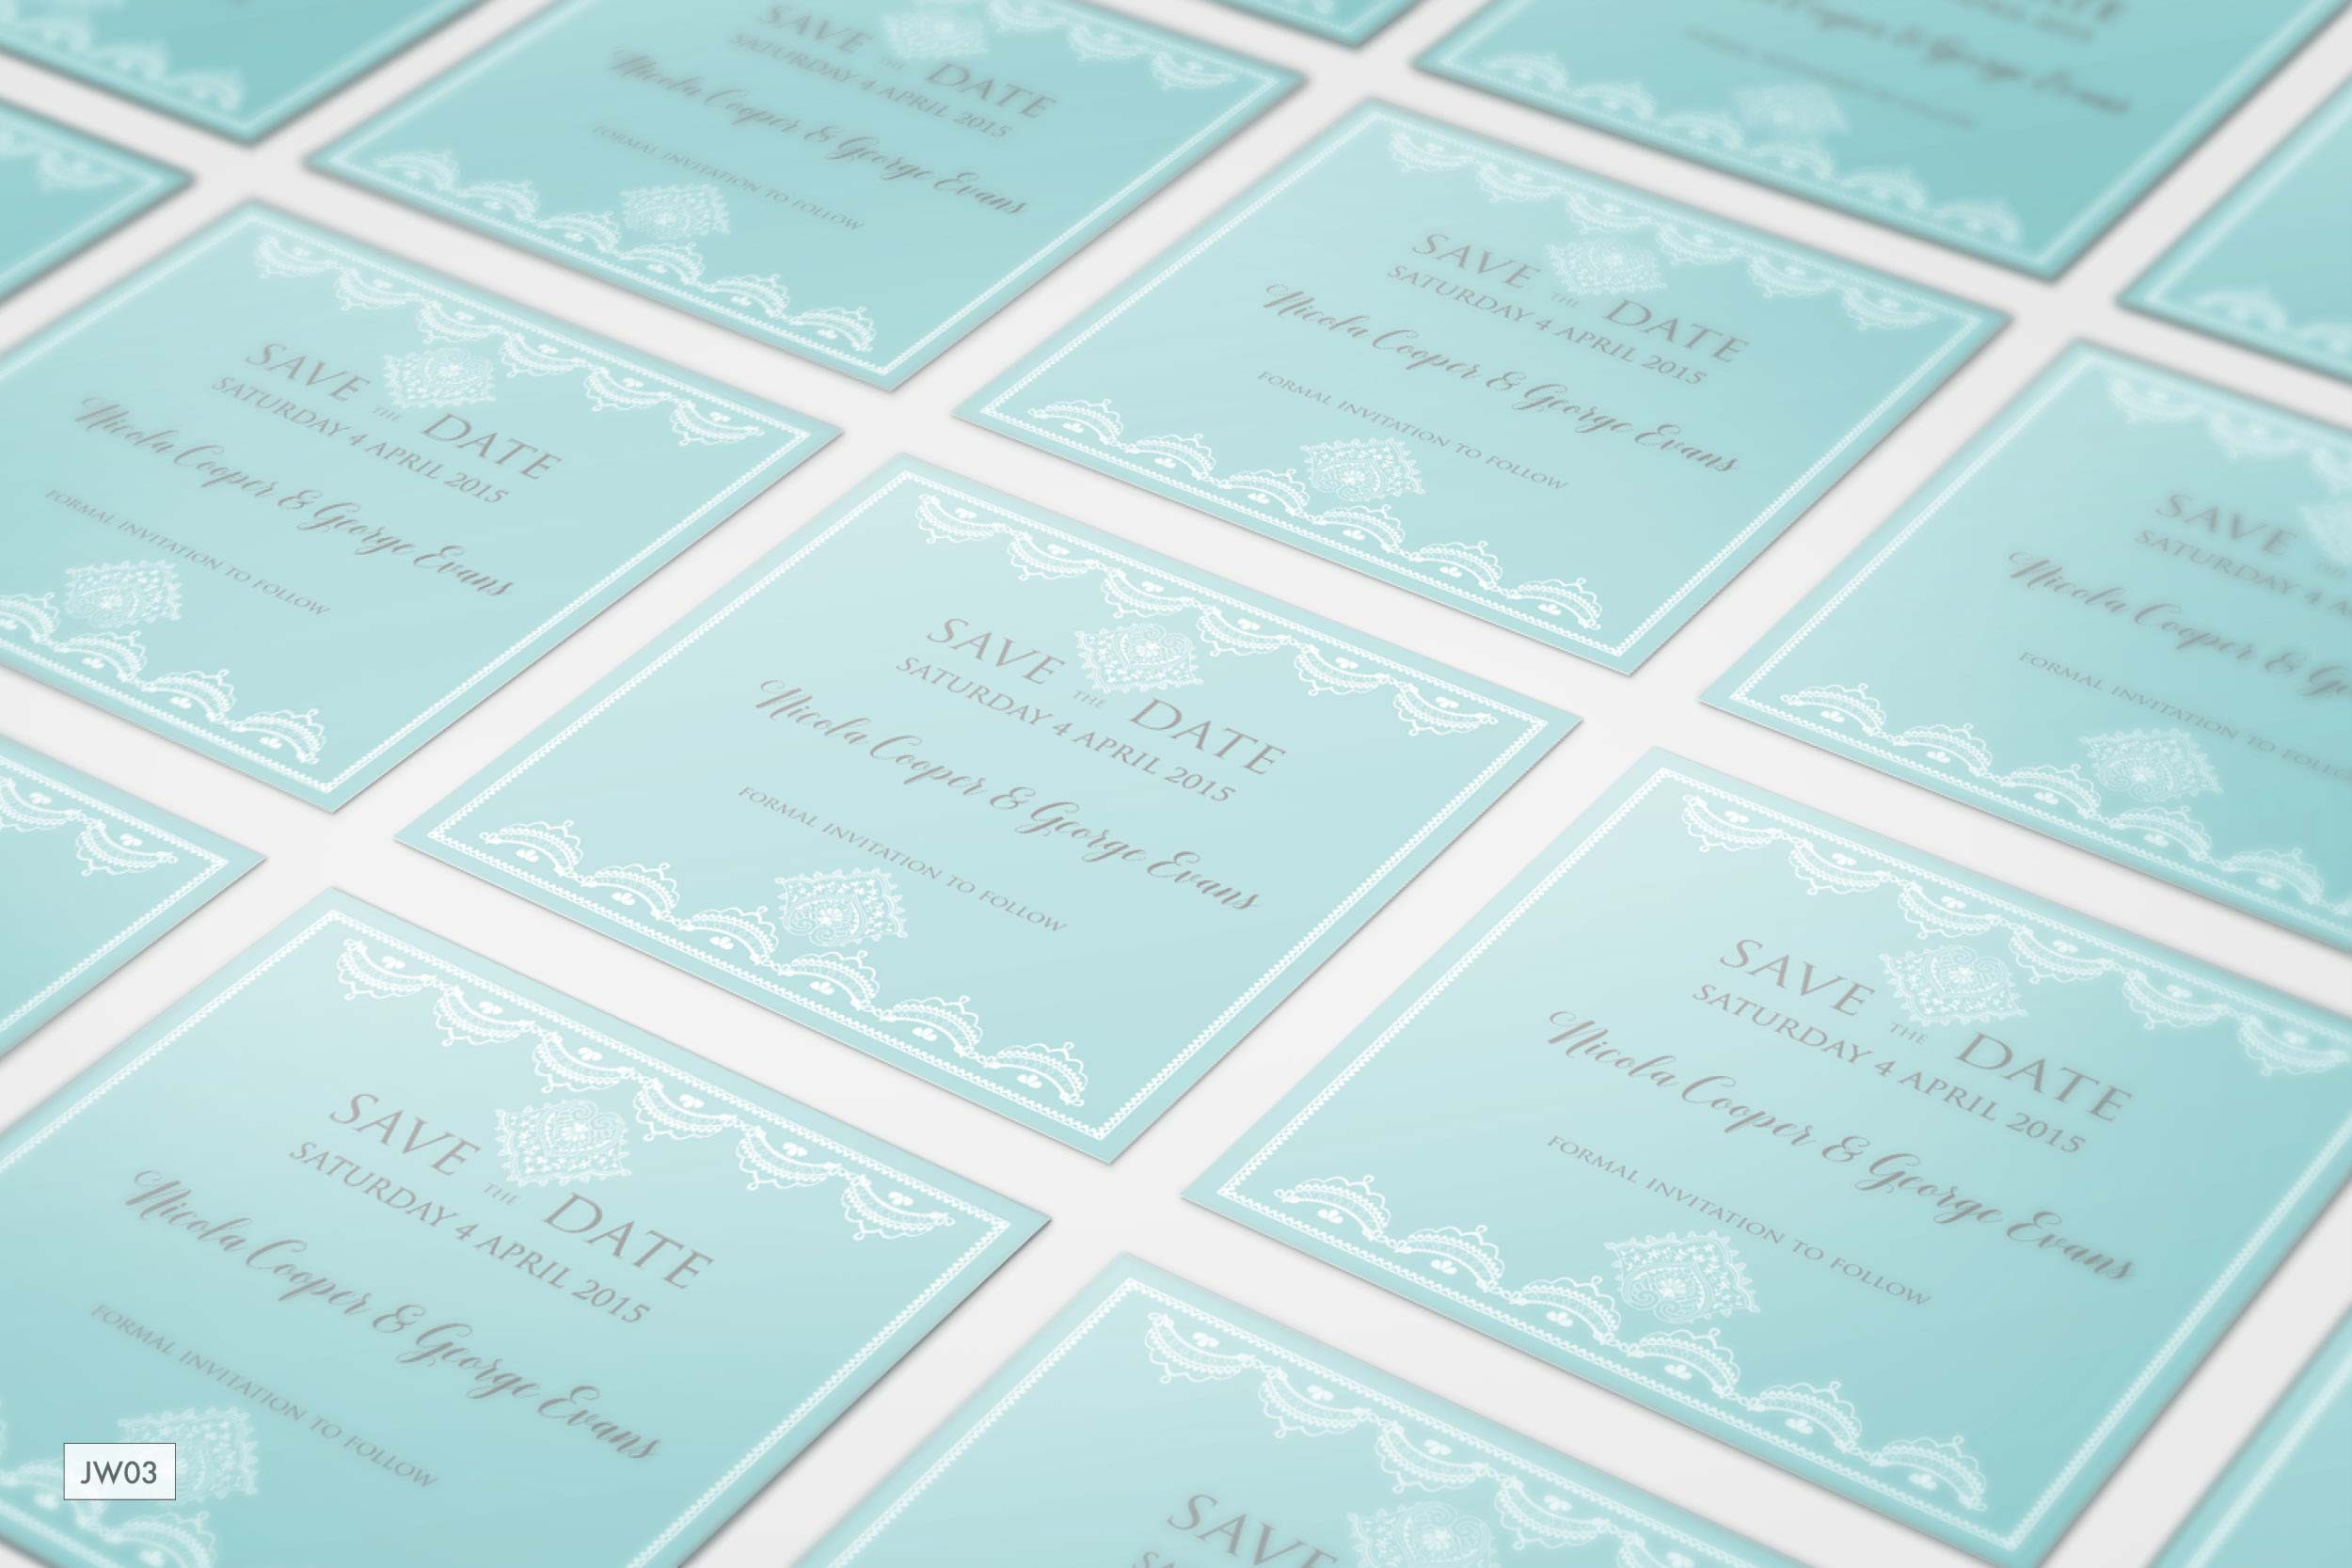 Teal-lace_Menu_jersey_weddings_ananyacards.com_02.jpg